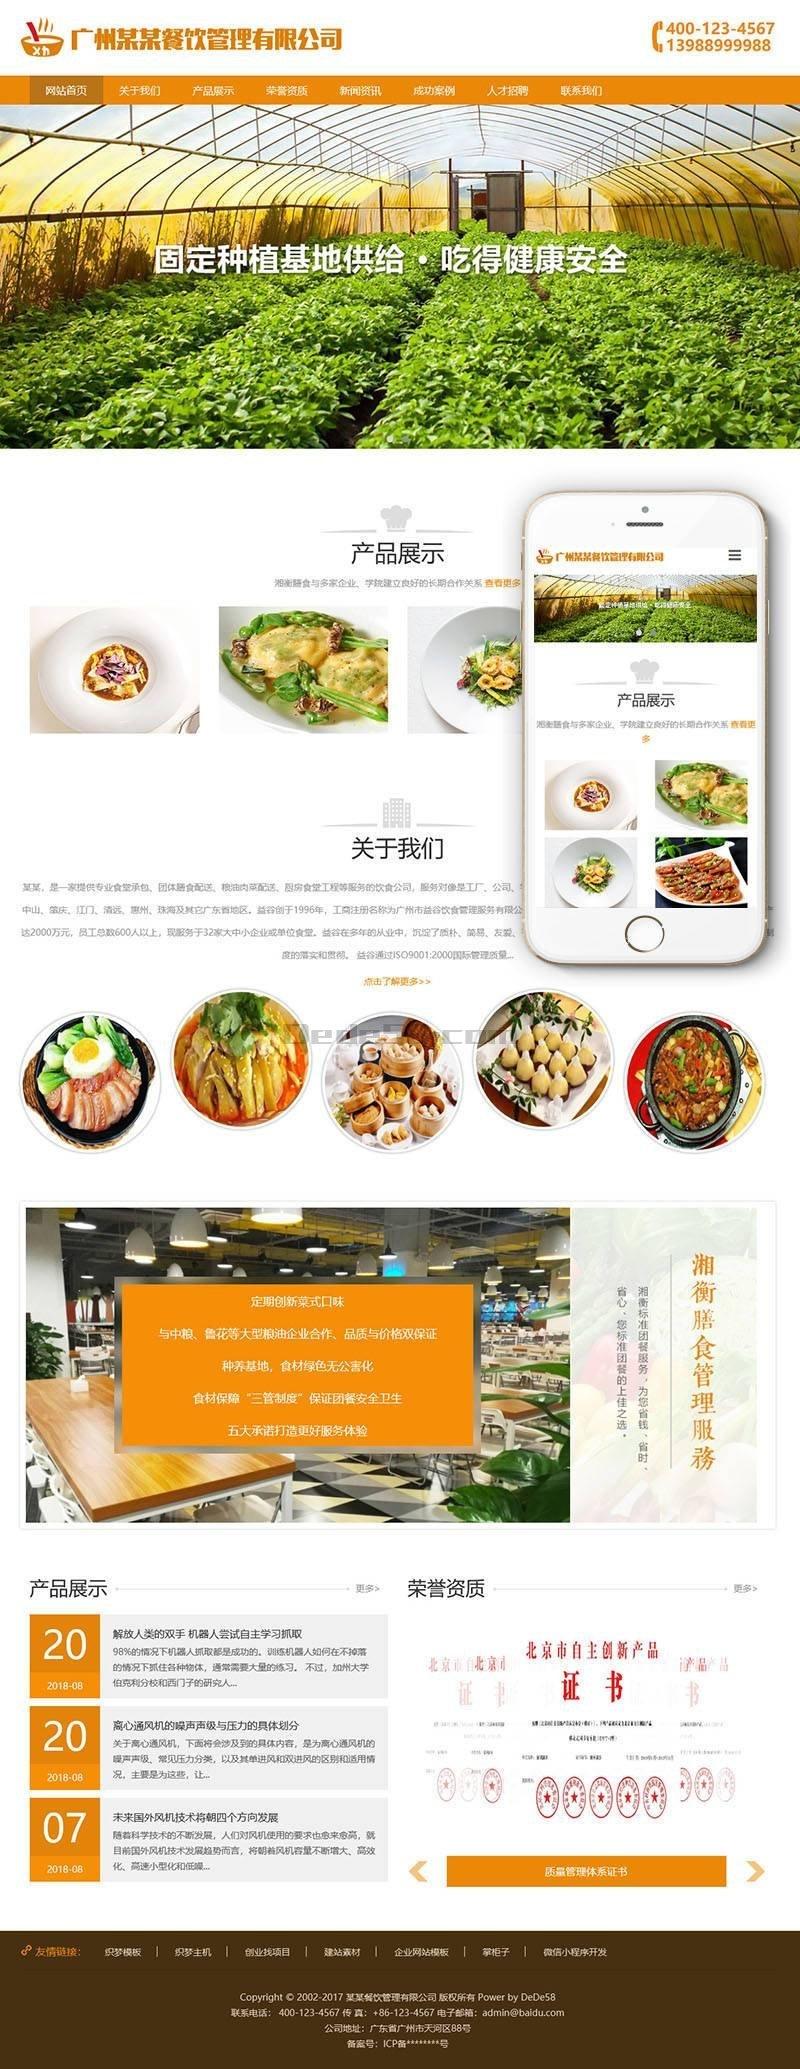 【dedecms】响应式膳食餐饮管理类织梦dedecms网站模板 自适应WAP-爱资源分享